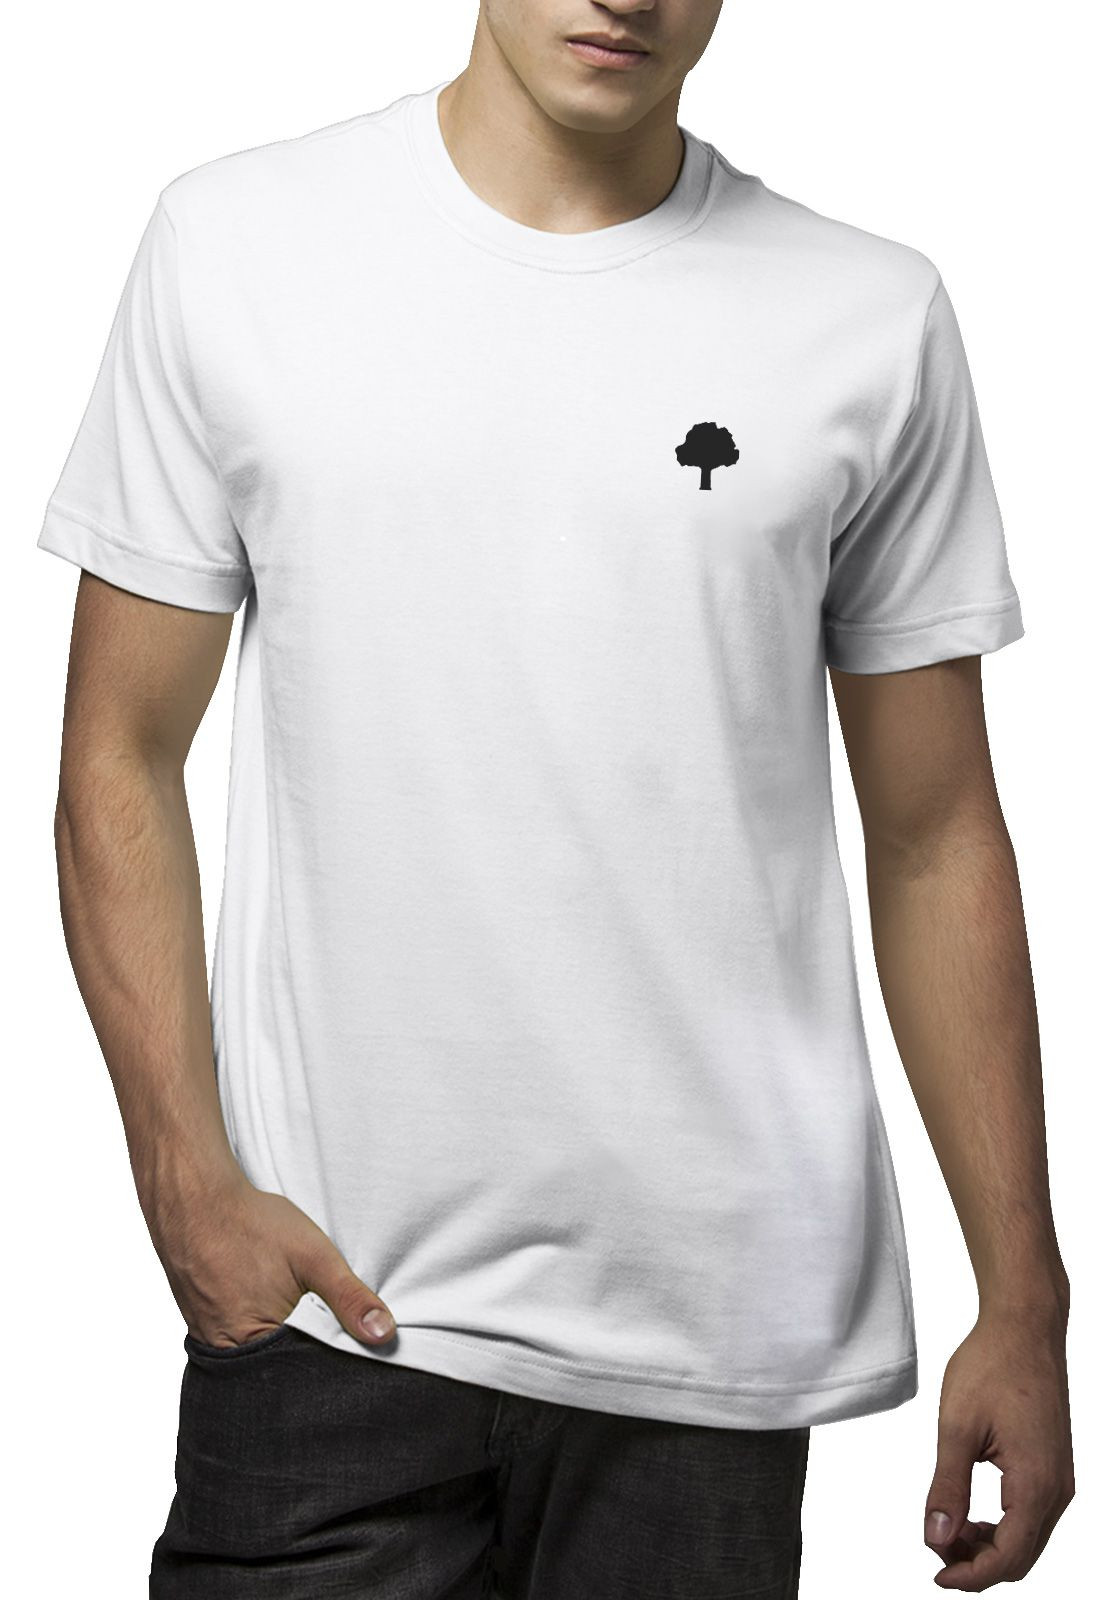 Camiseta Amazônia Mandala Pena - Branco